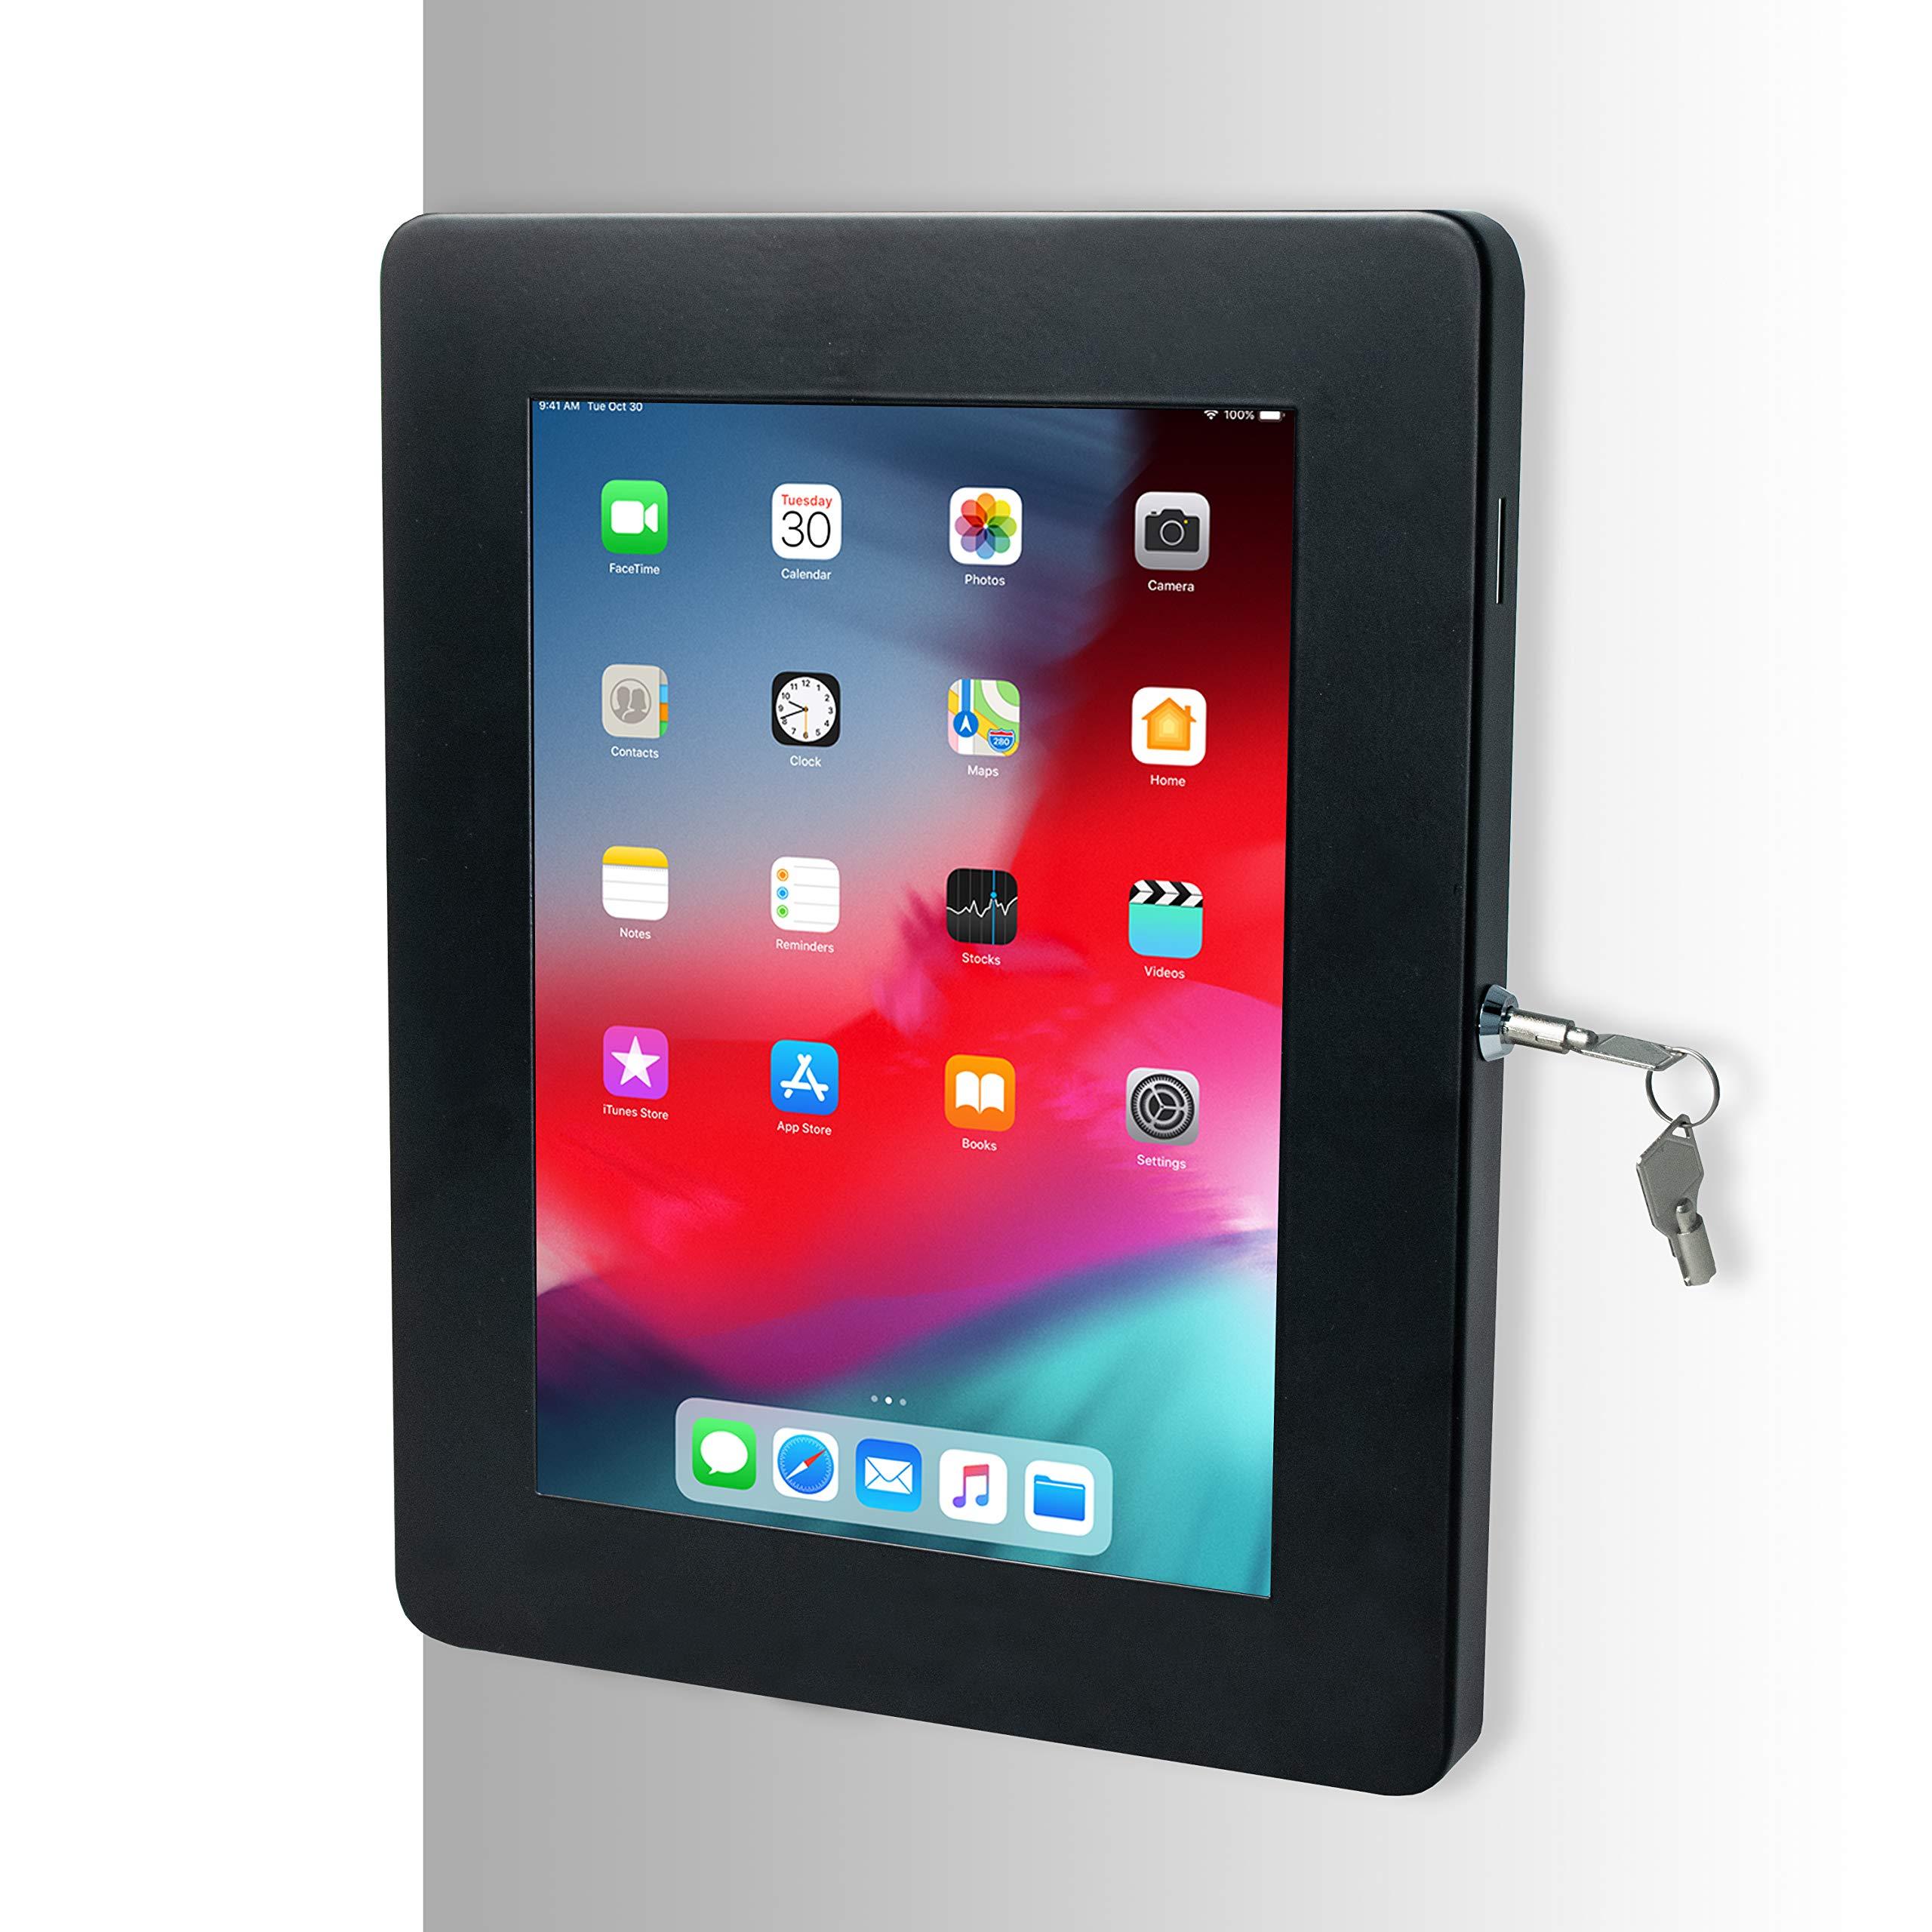 CTA Digital Premium Locking On-Wall Flush Mount for iPad Air 3 (2019), iPad Gen. 6 (2018), Galaxy Tab S3 9.7'', and More (PAD-PARAW)